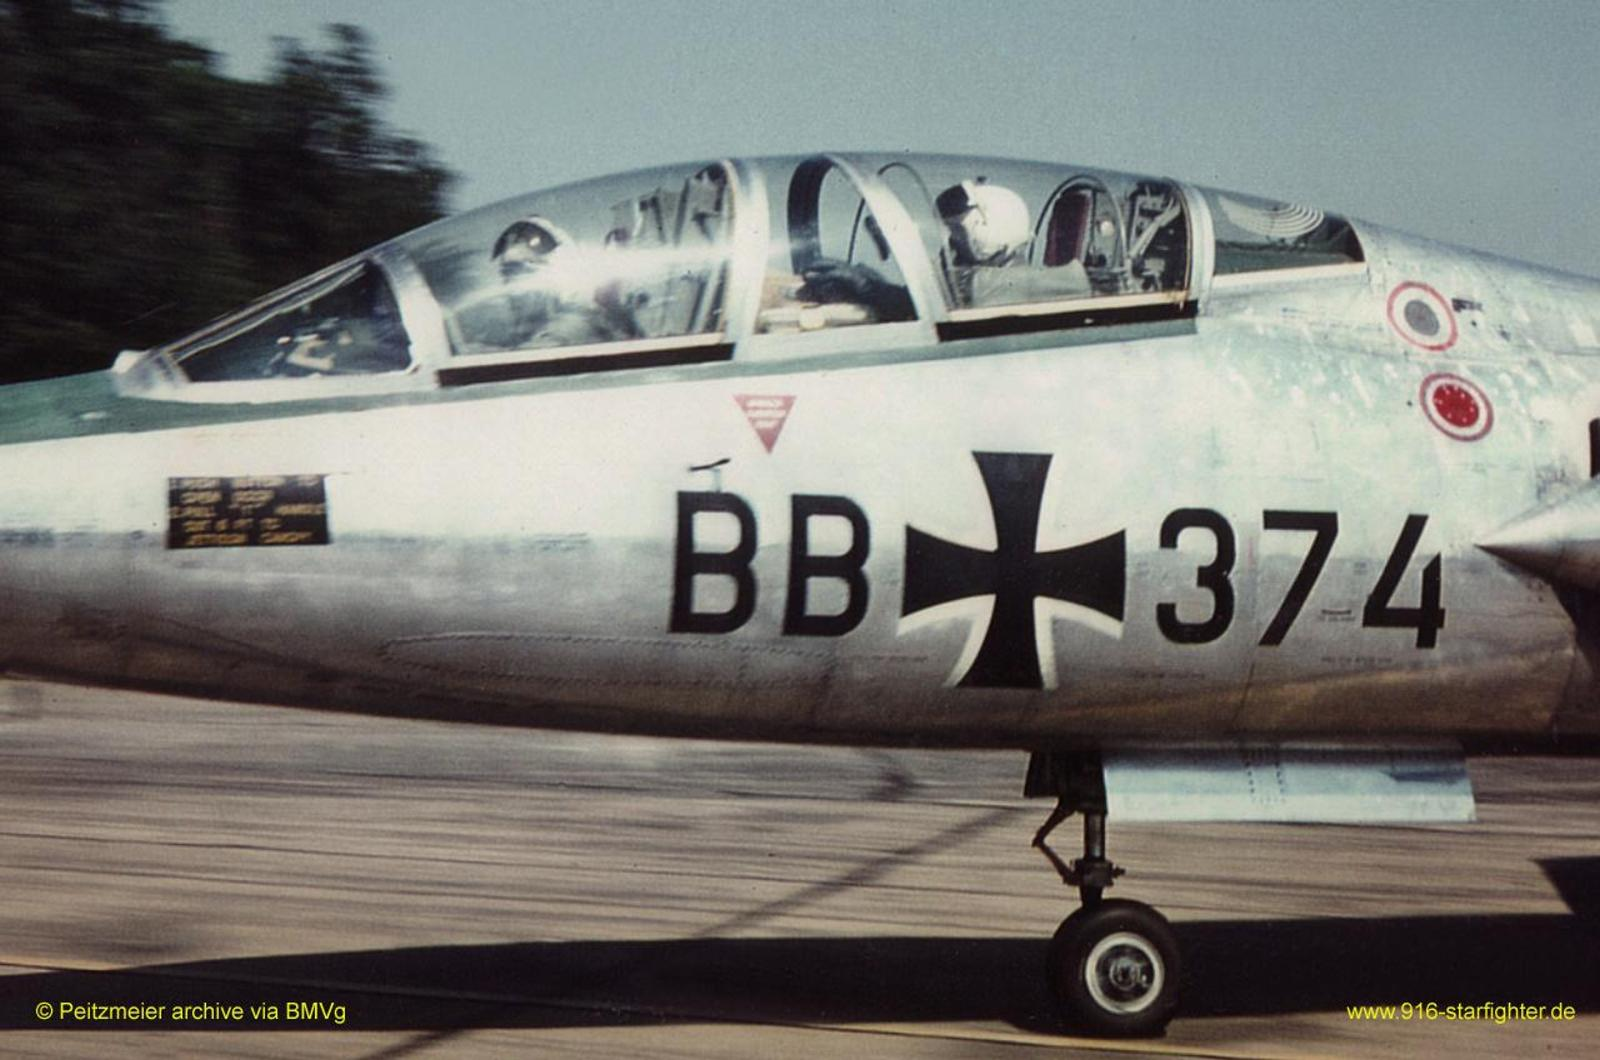 F-104F BB+374 Waffenschule der Luftwaffe 10 (WaSLw 10) at Norvenich AB  F-104F, construction number 283-5061, model 483-04-08, US serial number  59-5008, ...